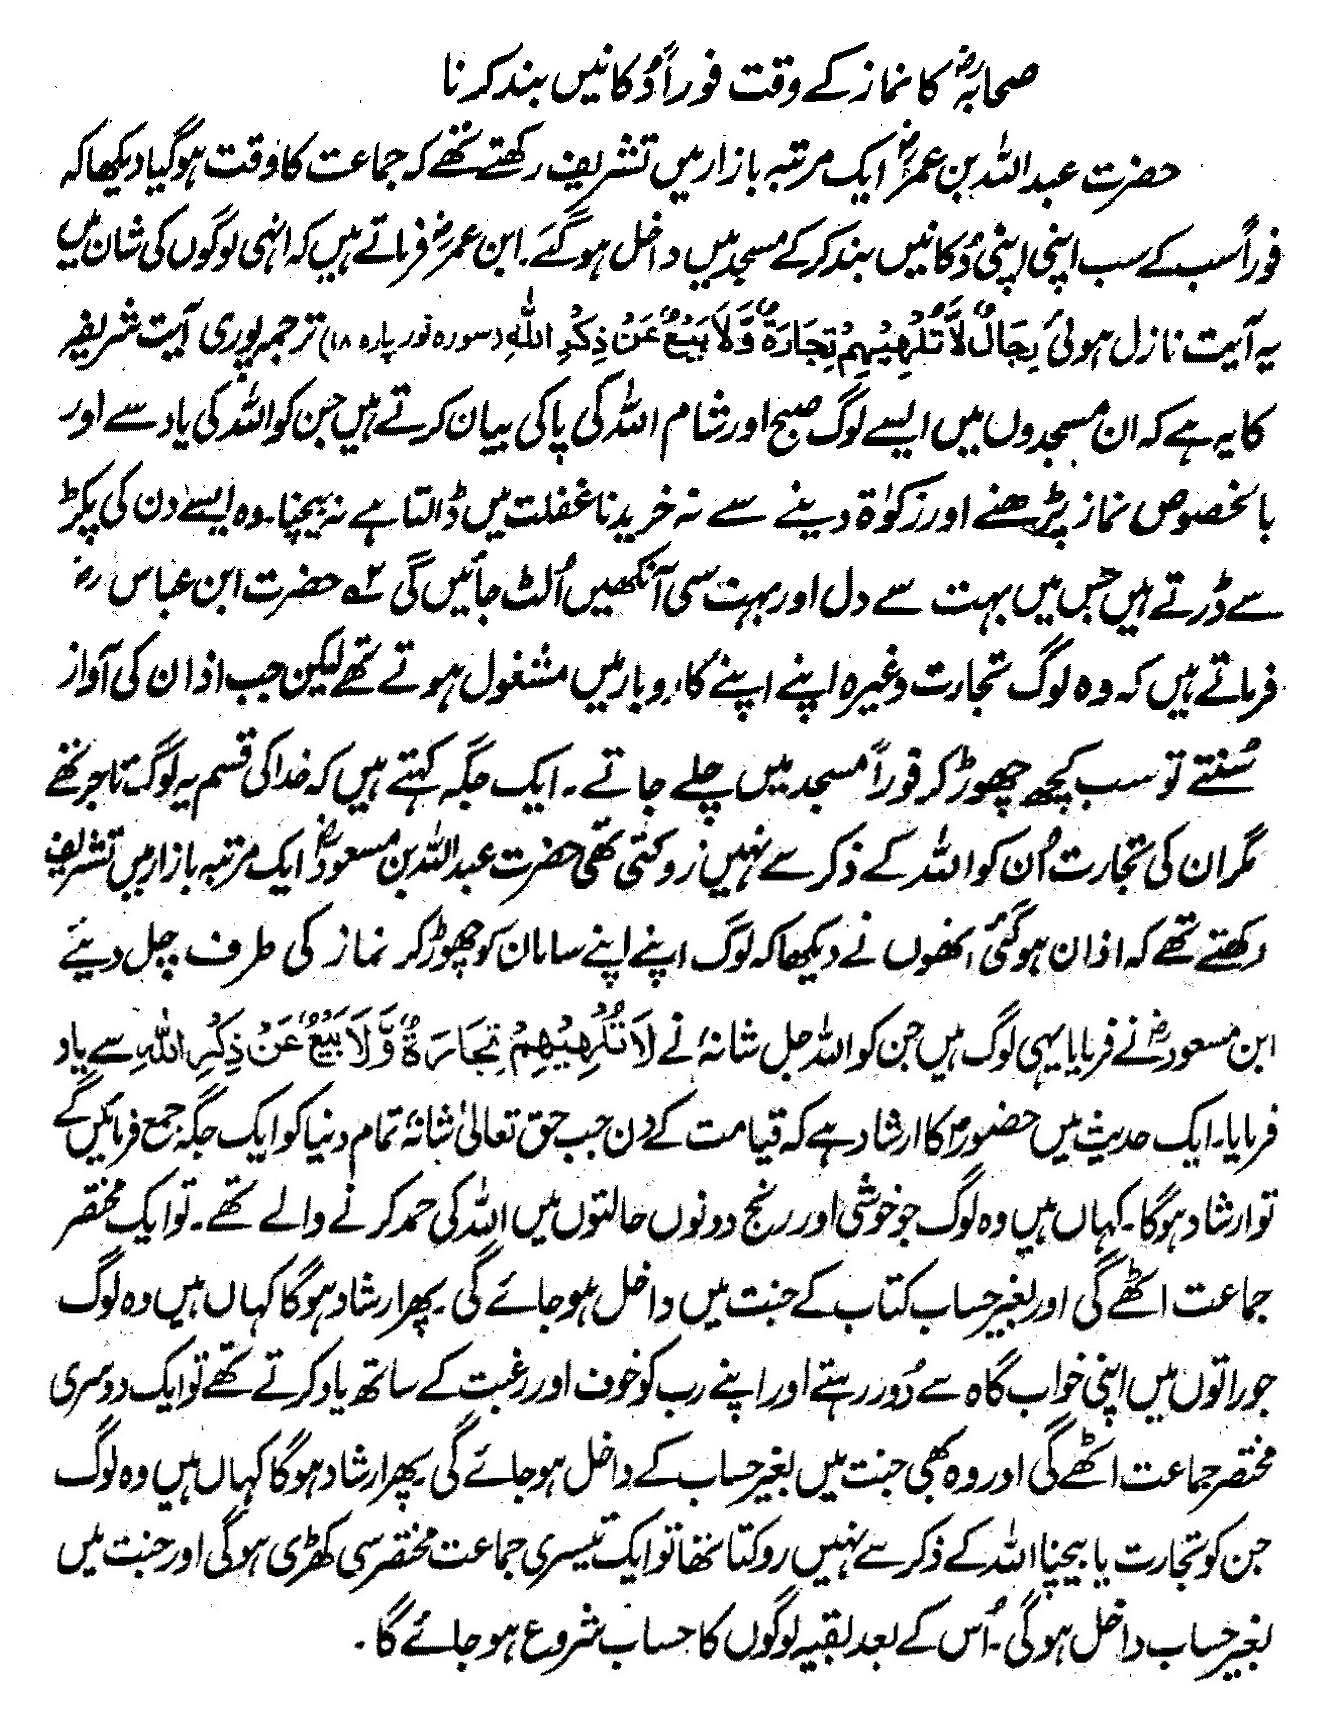 Sahabah's Suspending Trade at the Time of Salah